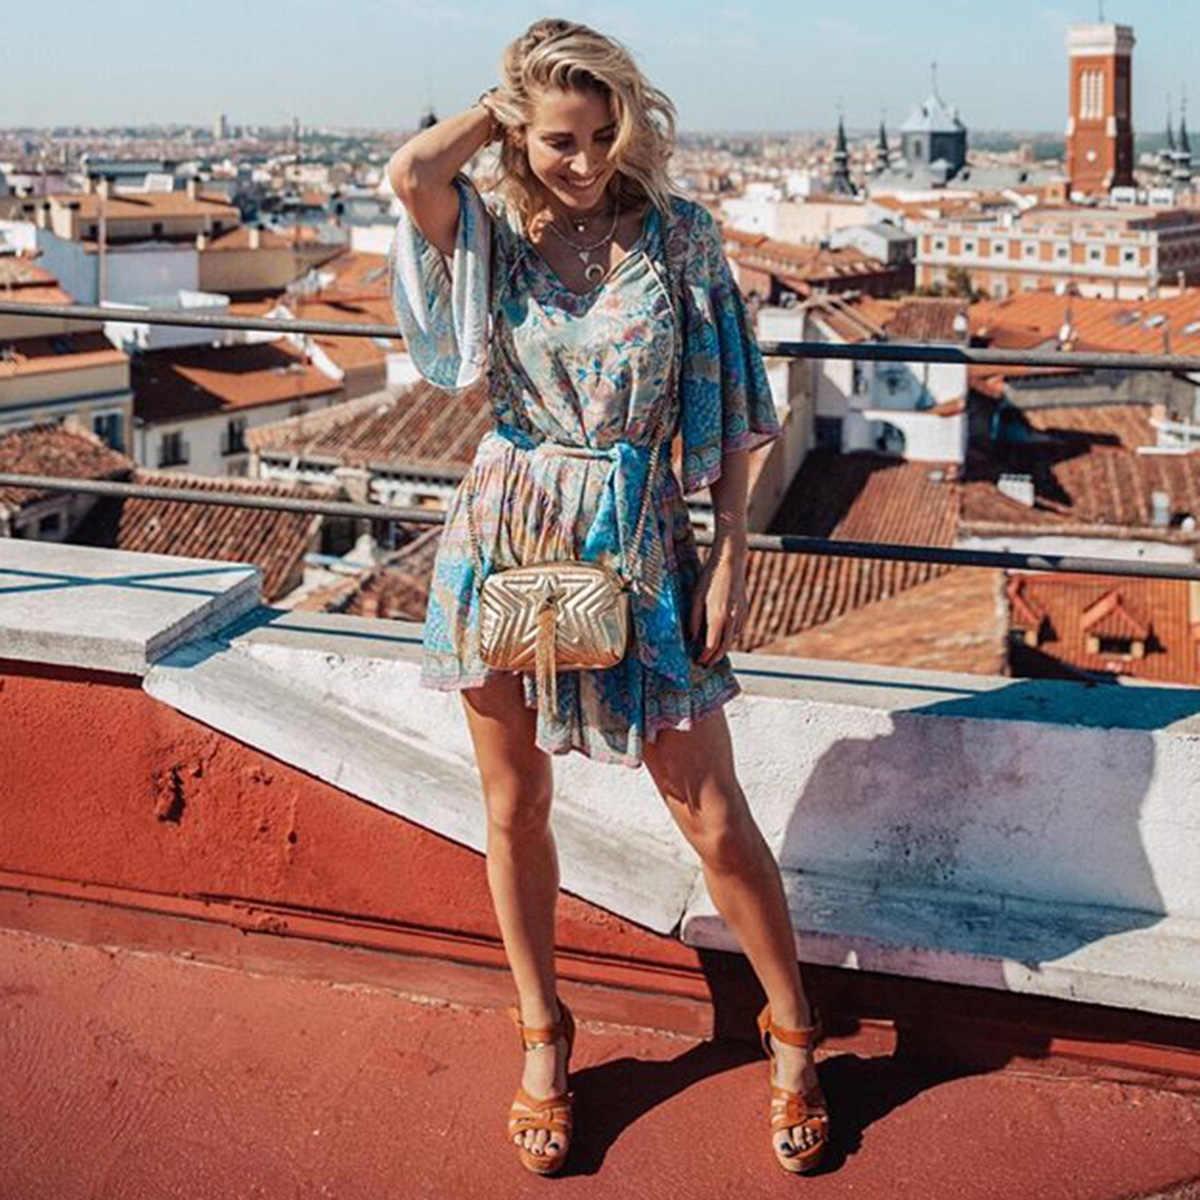 e0d604072c39 ... Jastie Gypsy Oasis Mini Dress Drop Waist Ruffle Hem Boho Beach Dresses  Pleated Sleeve Casual Women ...